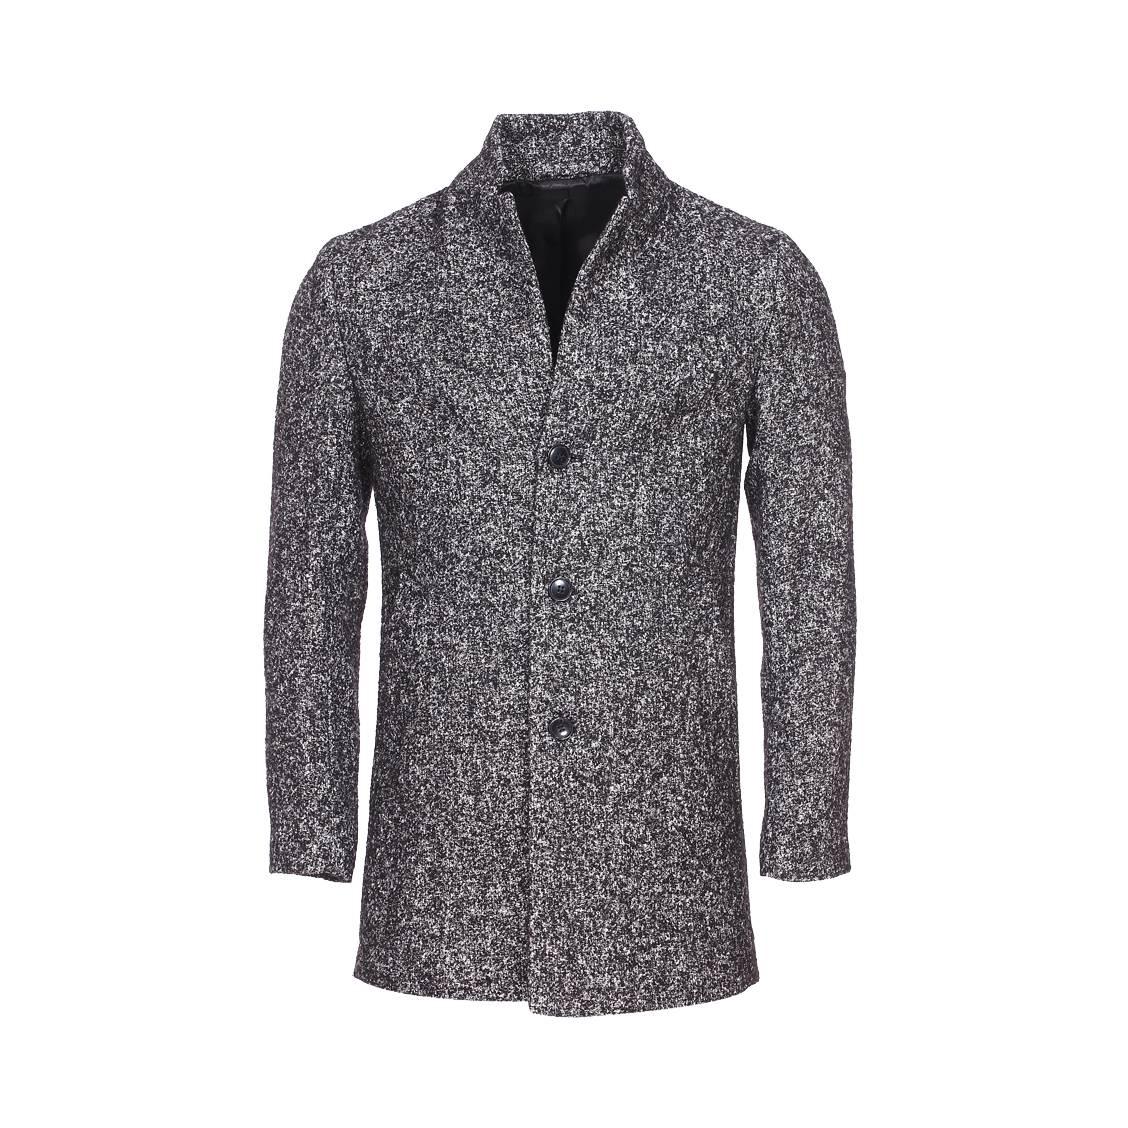 Selected - manteau, caban, duffle coat